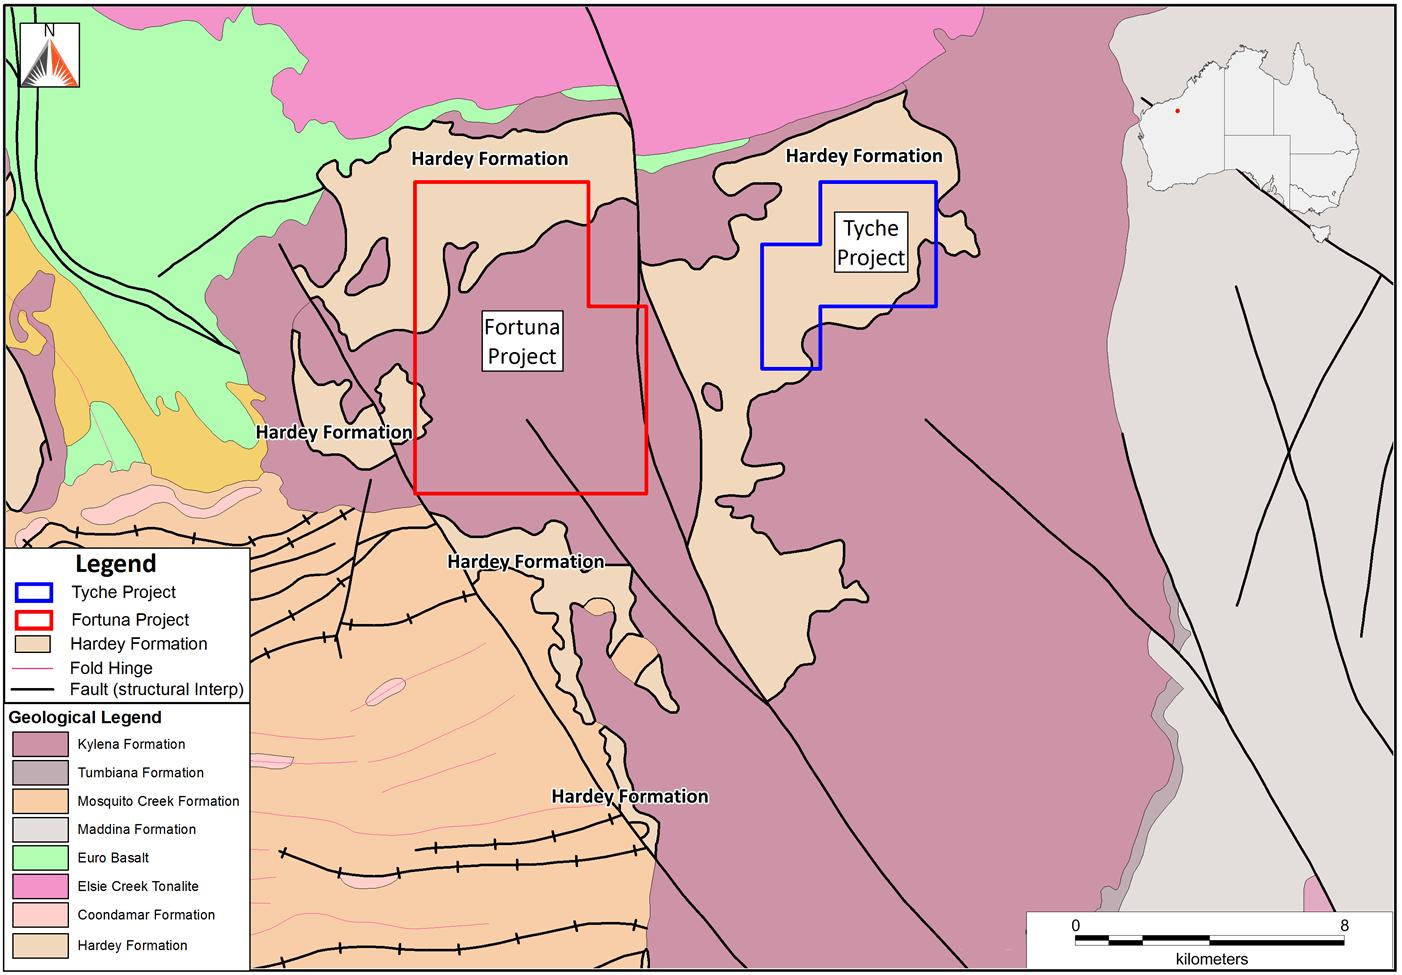 Fortuna and Tyche Projects - gold mine in Western Australia's Pilbara region